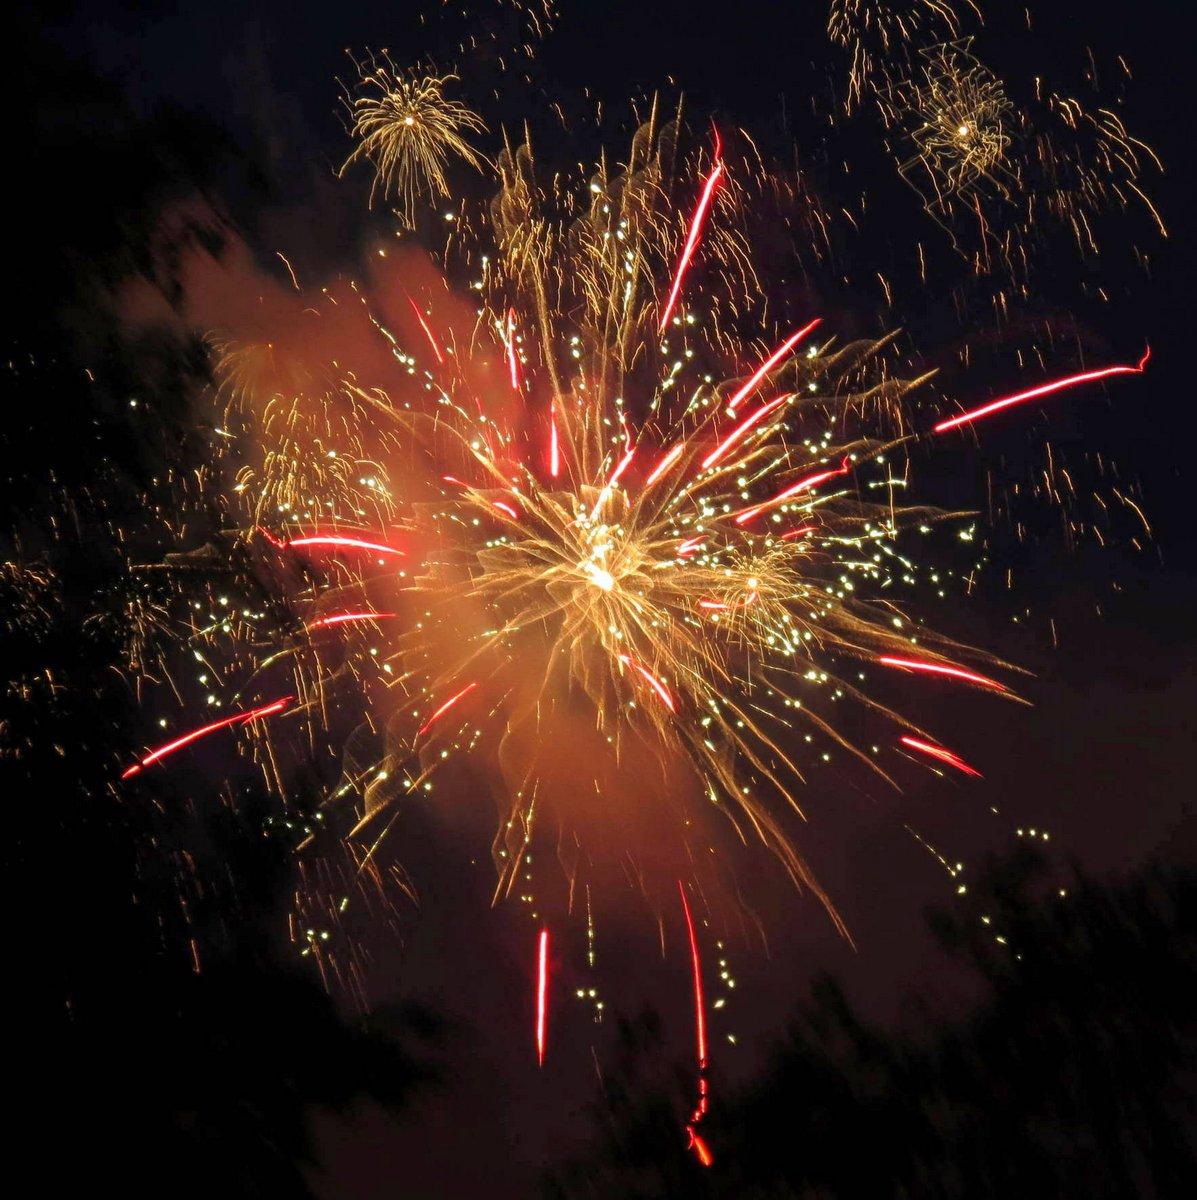 6. Fireworks